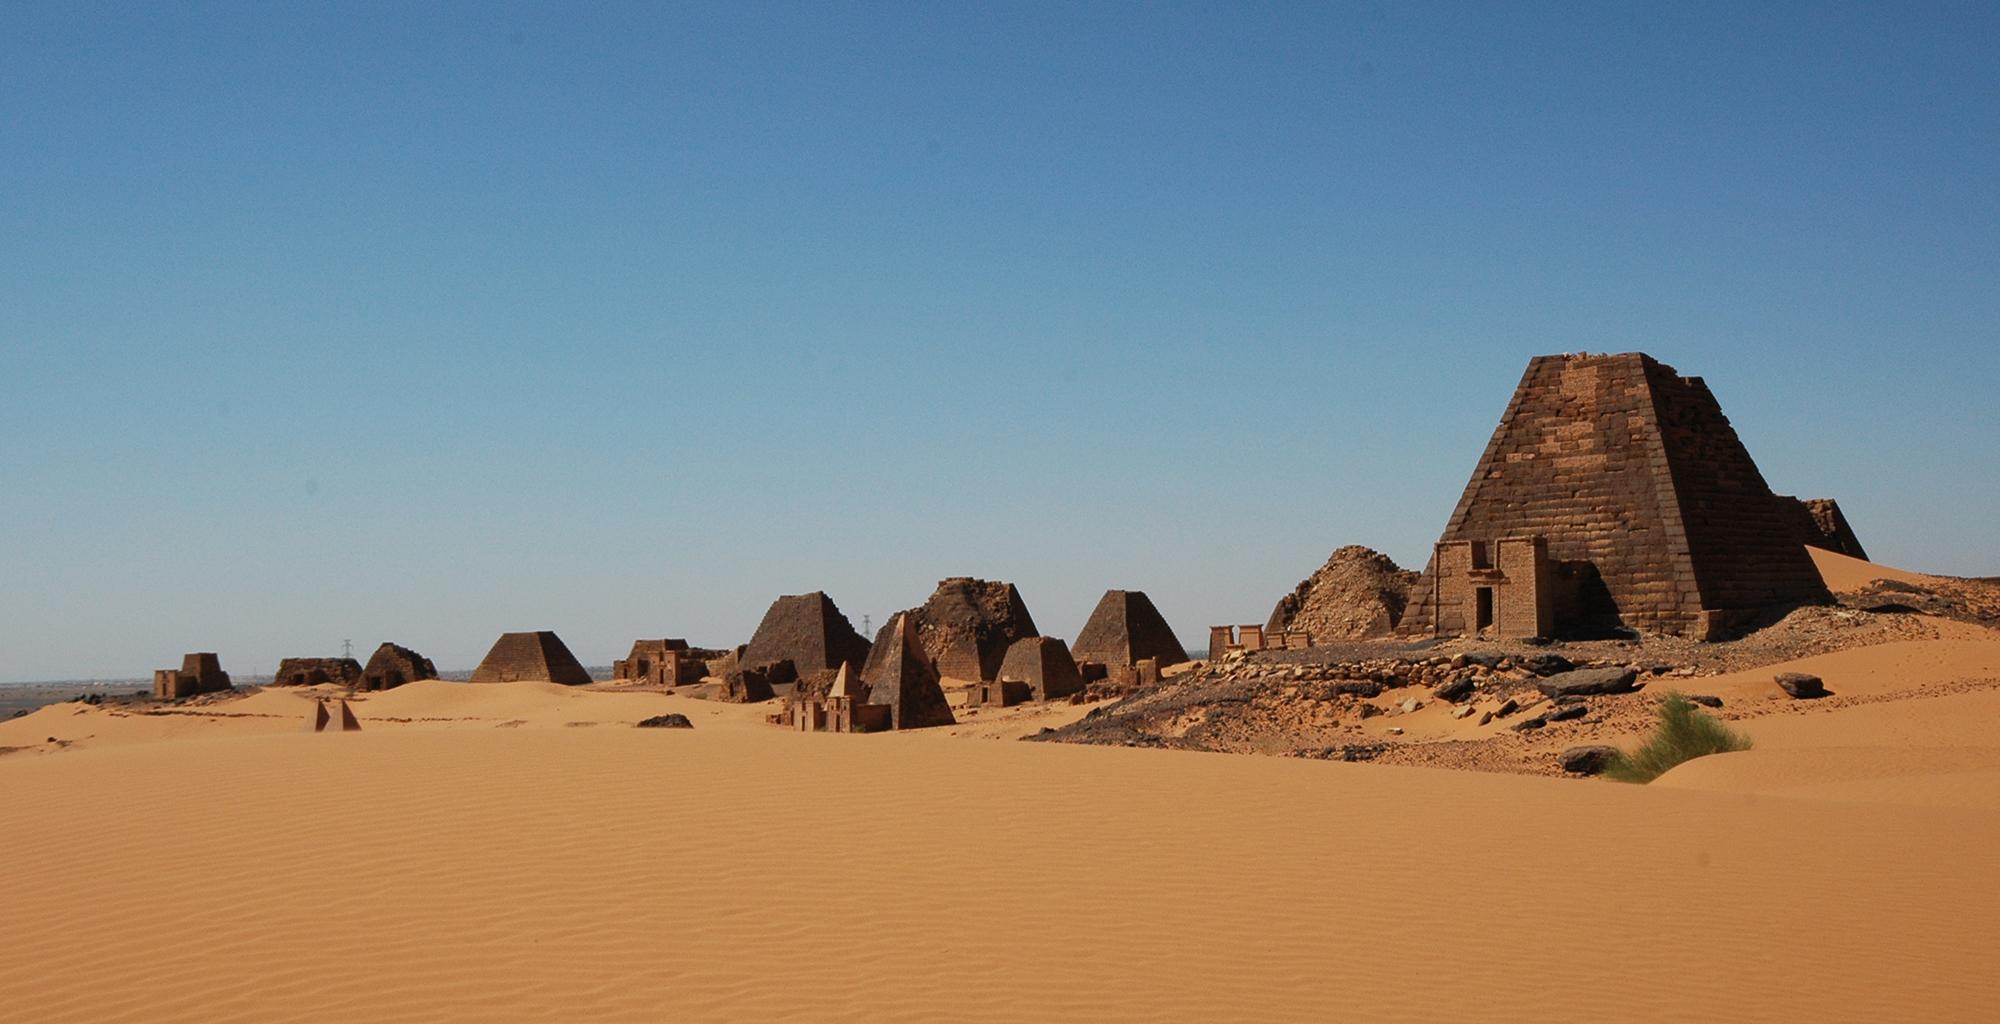 Sudan-Meroe-Tented-Camp-Architecture